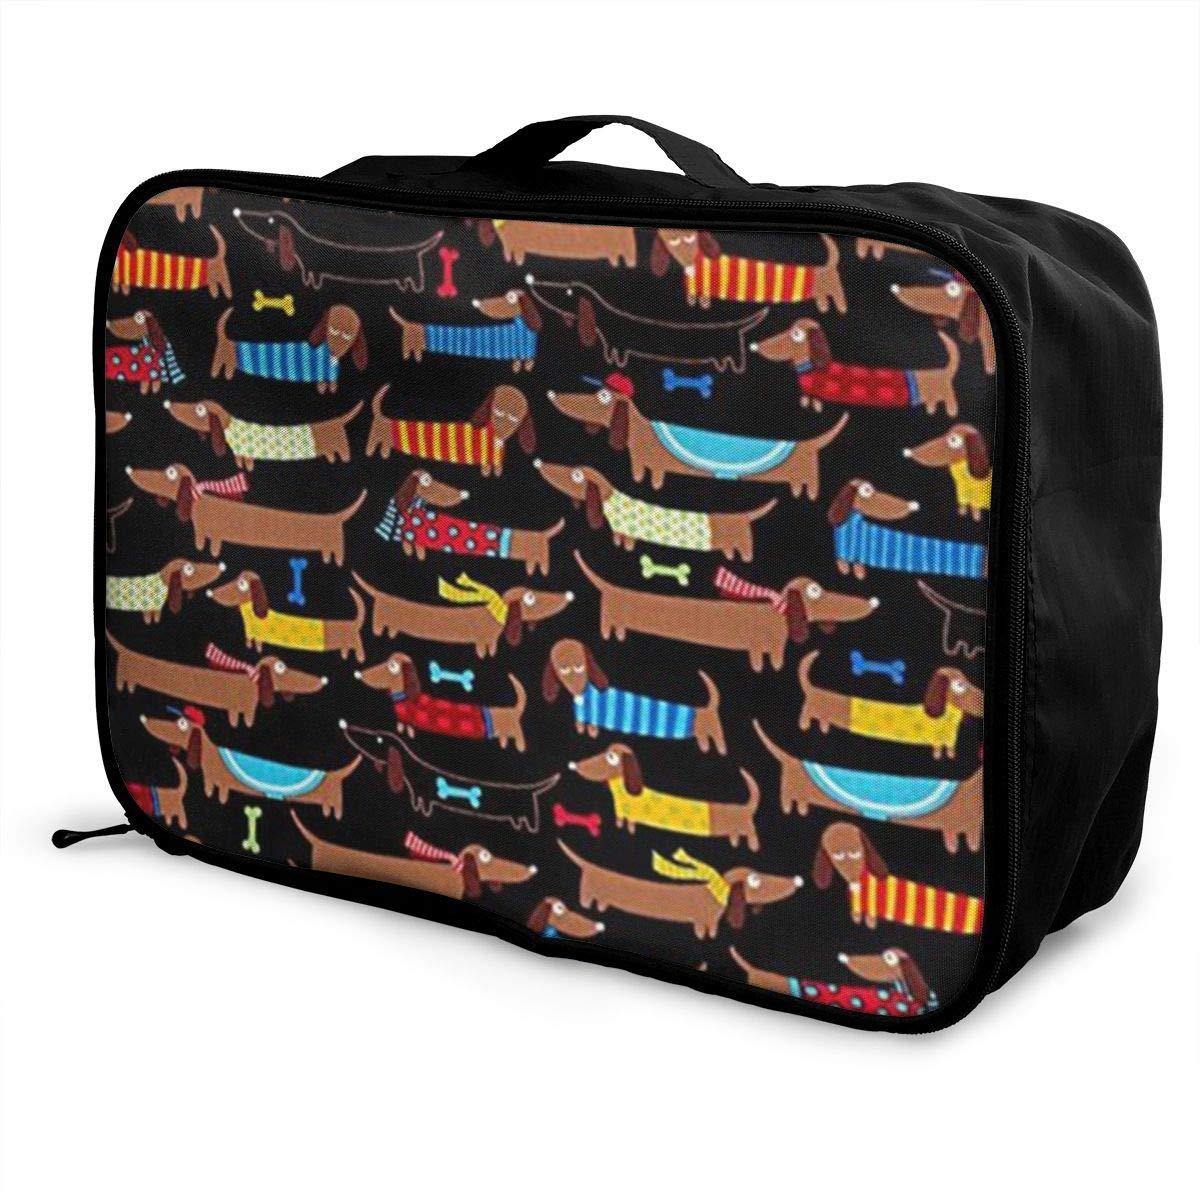 ADGAI I Love My Dog Dachshunds Canvas Travel Weekender Bag,Fashion Custom Lightweight Large Capacity Portable Luggage Bag,Suitcase Trolley Bag